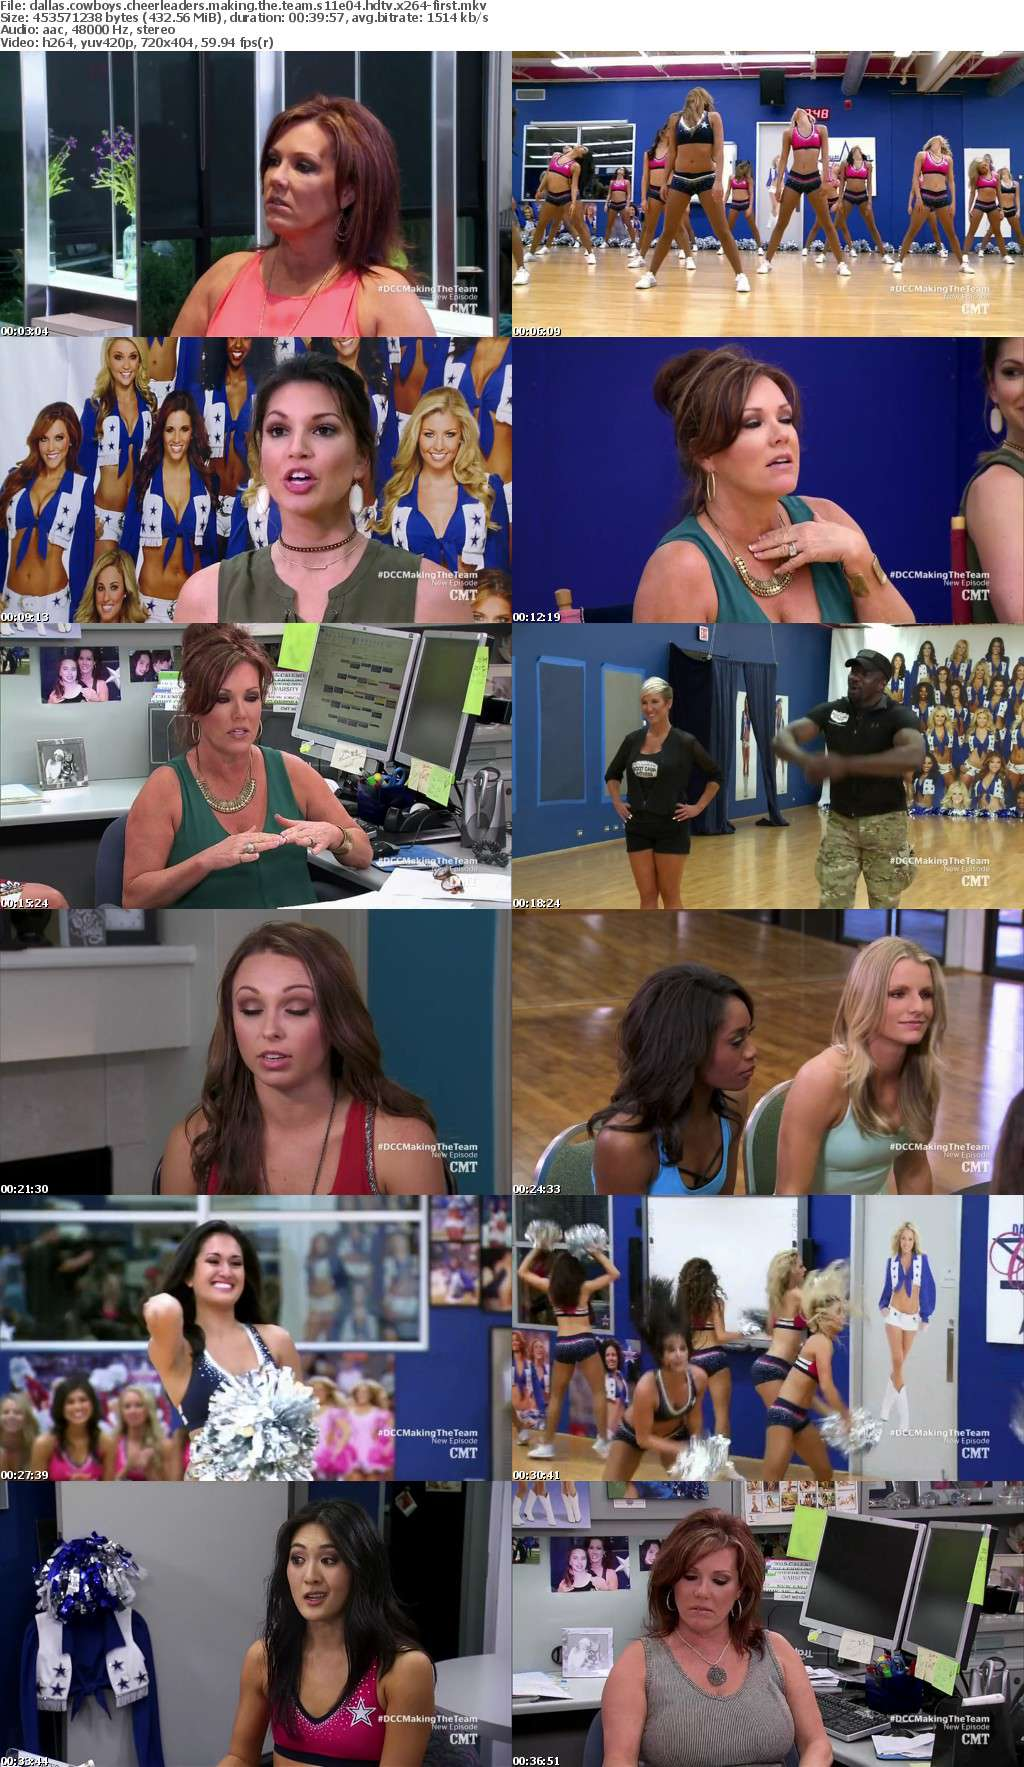 Dallas Cowboys Cheerleaders Making the Team S11E04 HDTV x264-FIRST